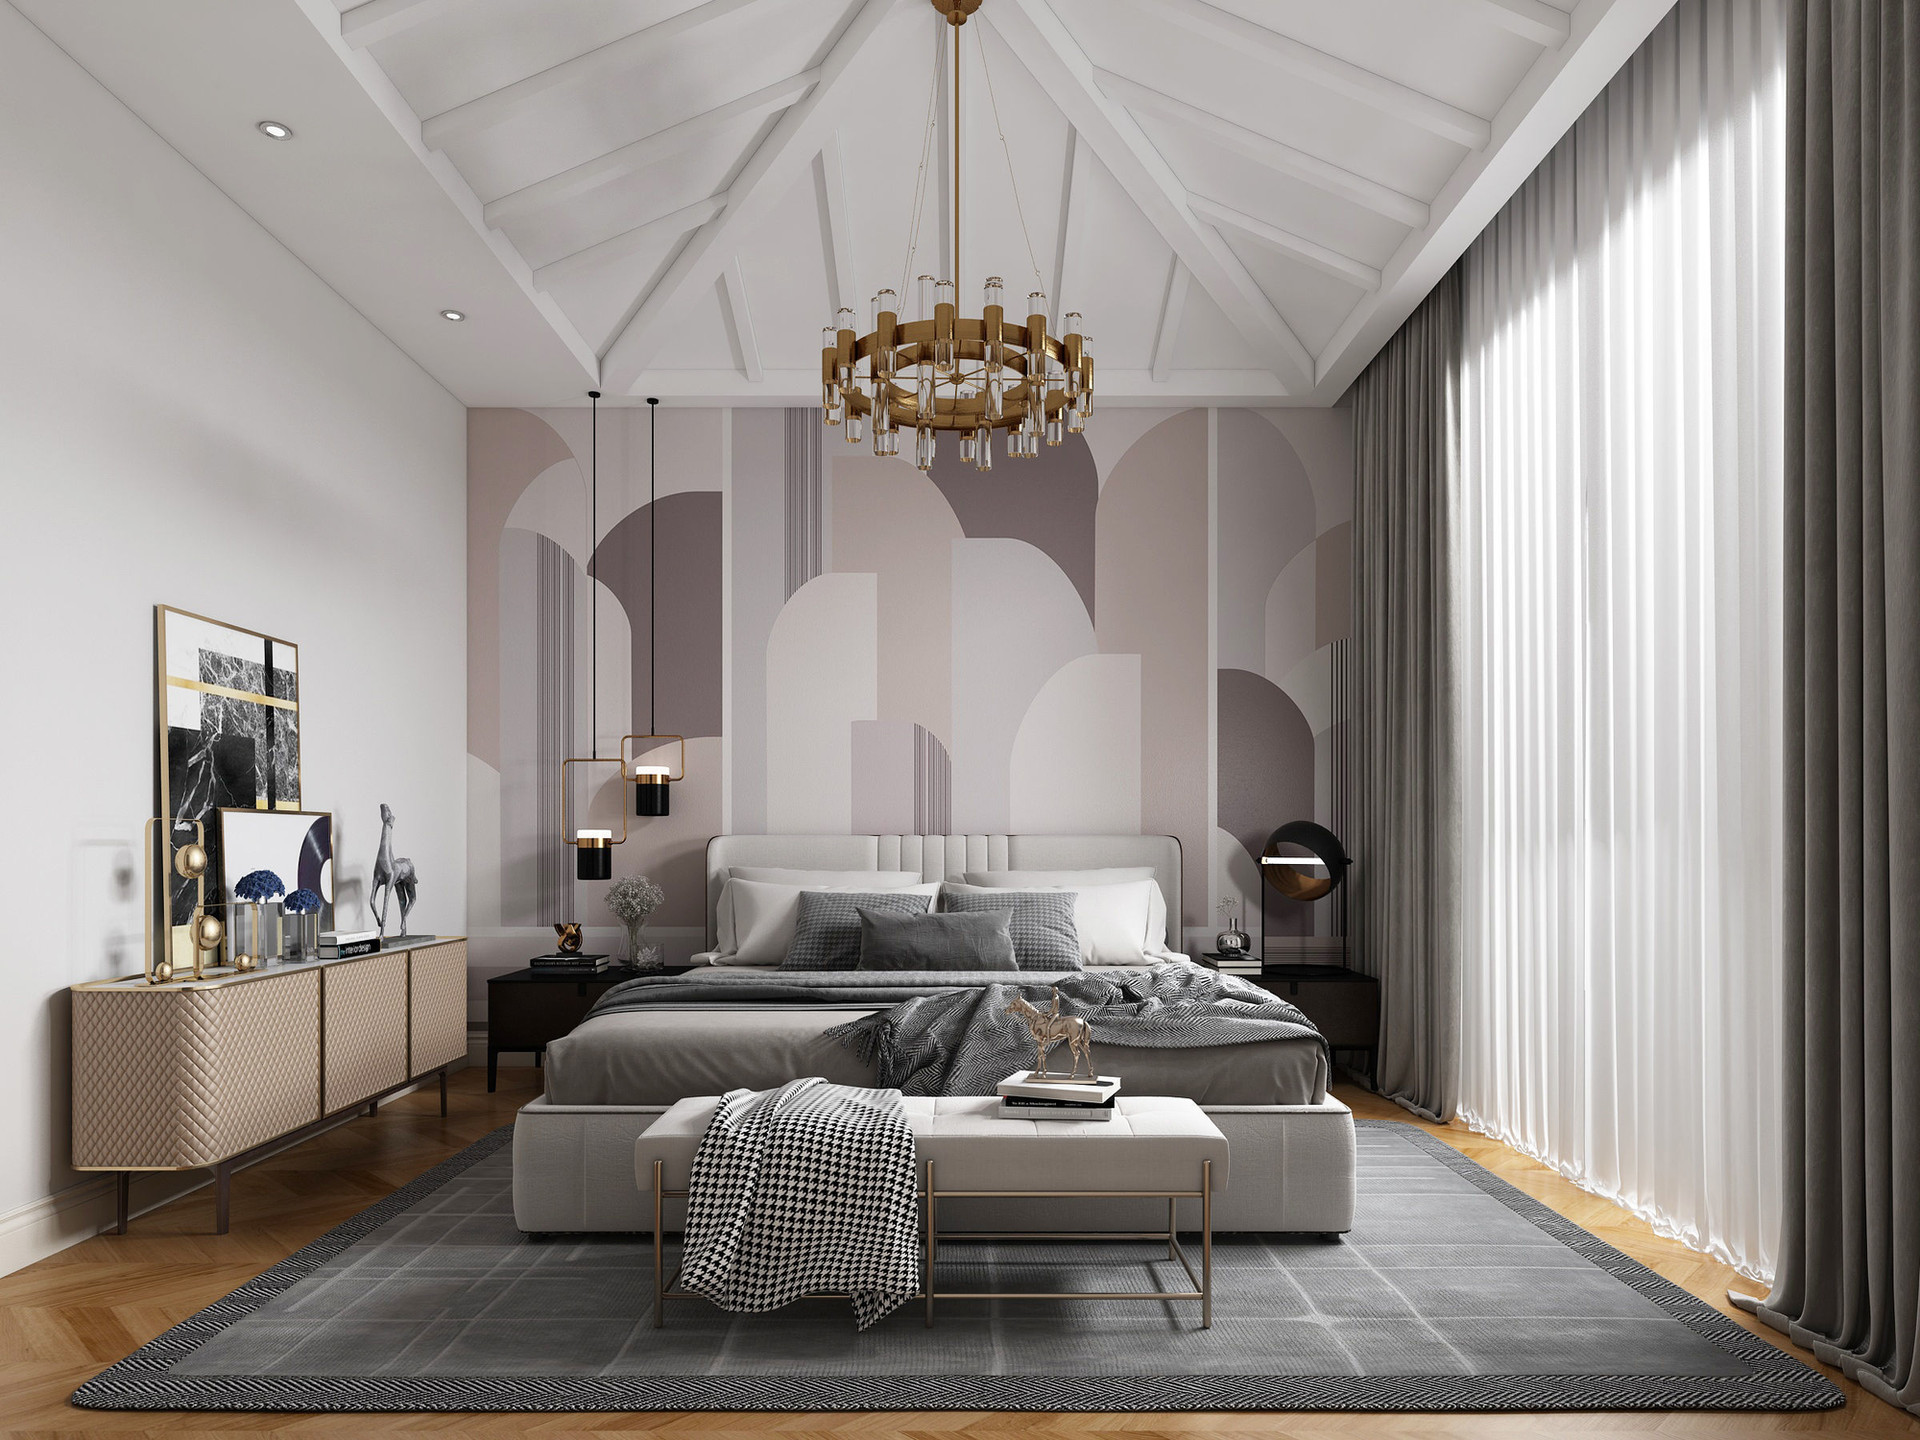 bedroom-3d-model-max-obj-3ds-fbx (2).jpg